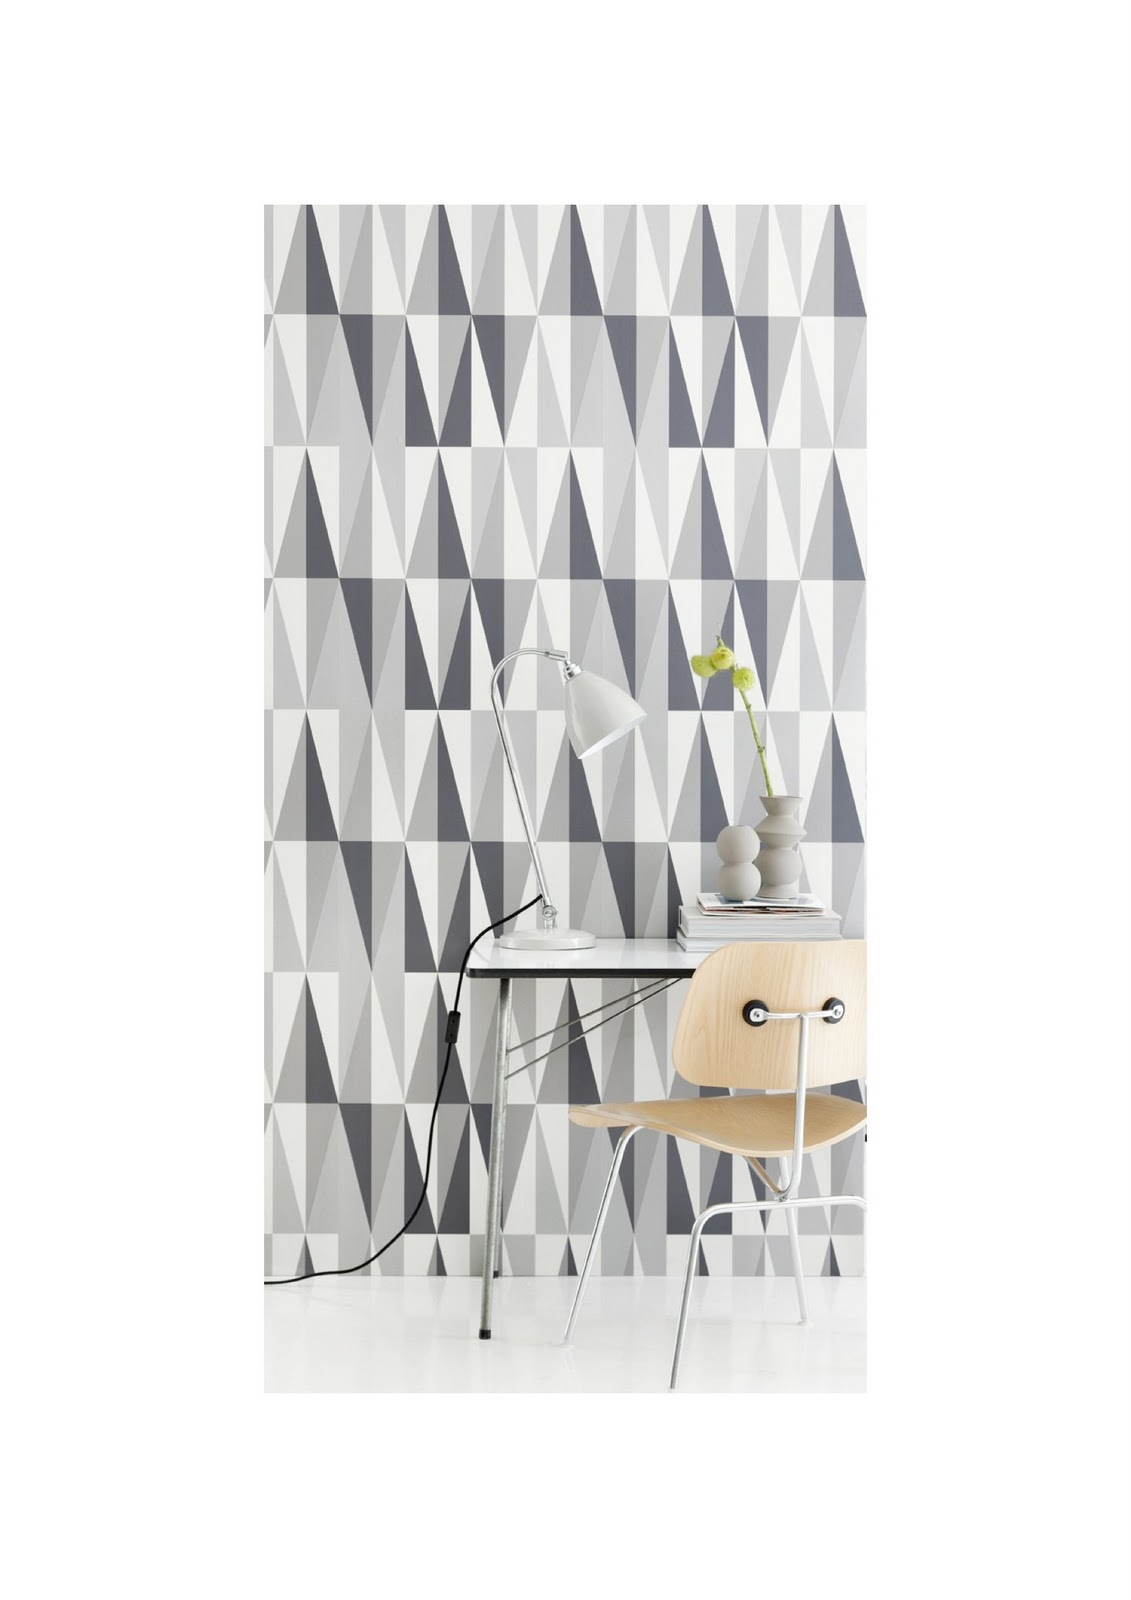 herz chie tapete oder farbe. Black Bedroom Furniture Sets. Home Design Ideas